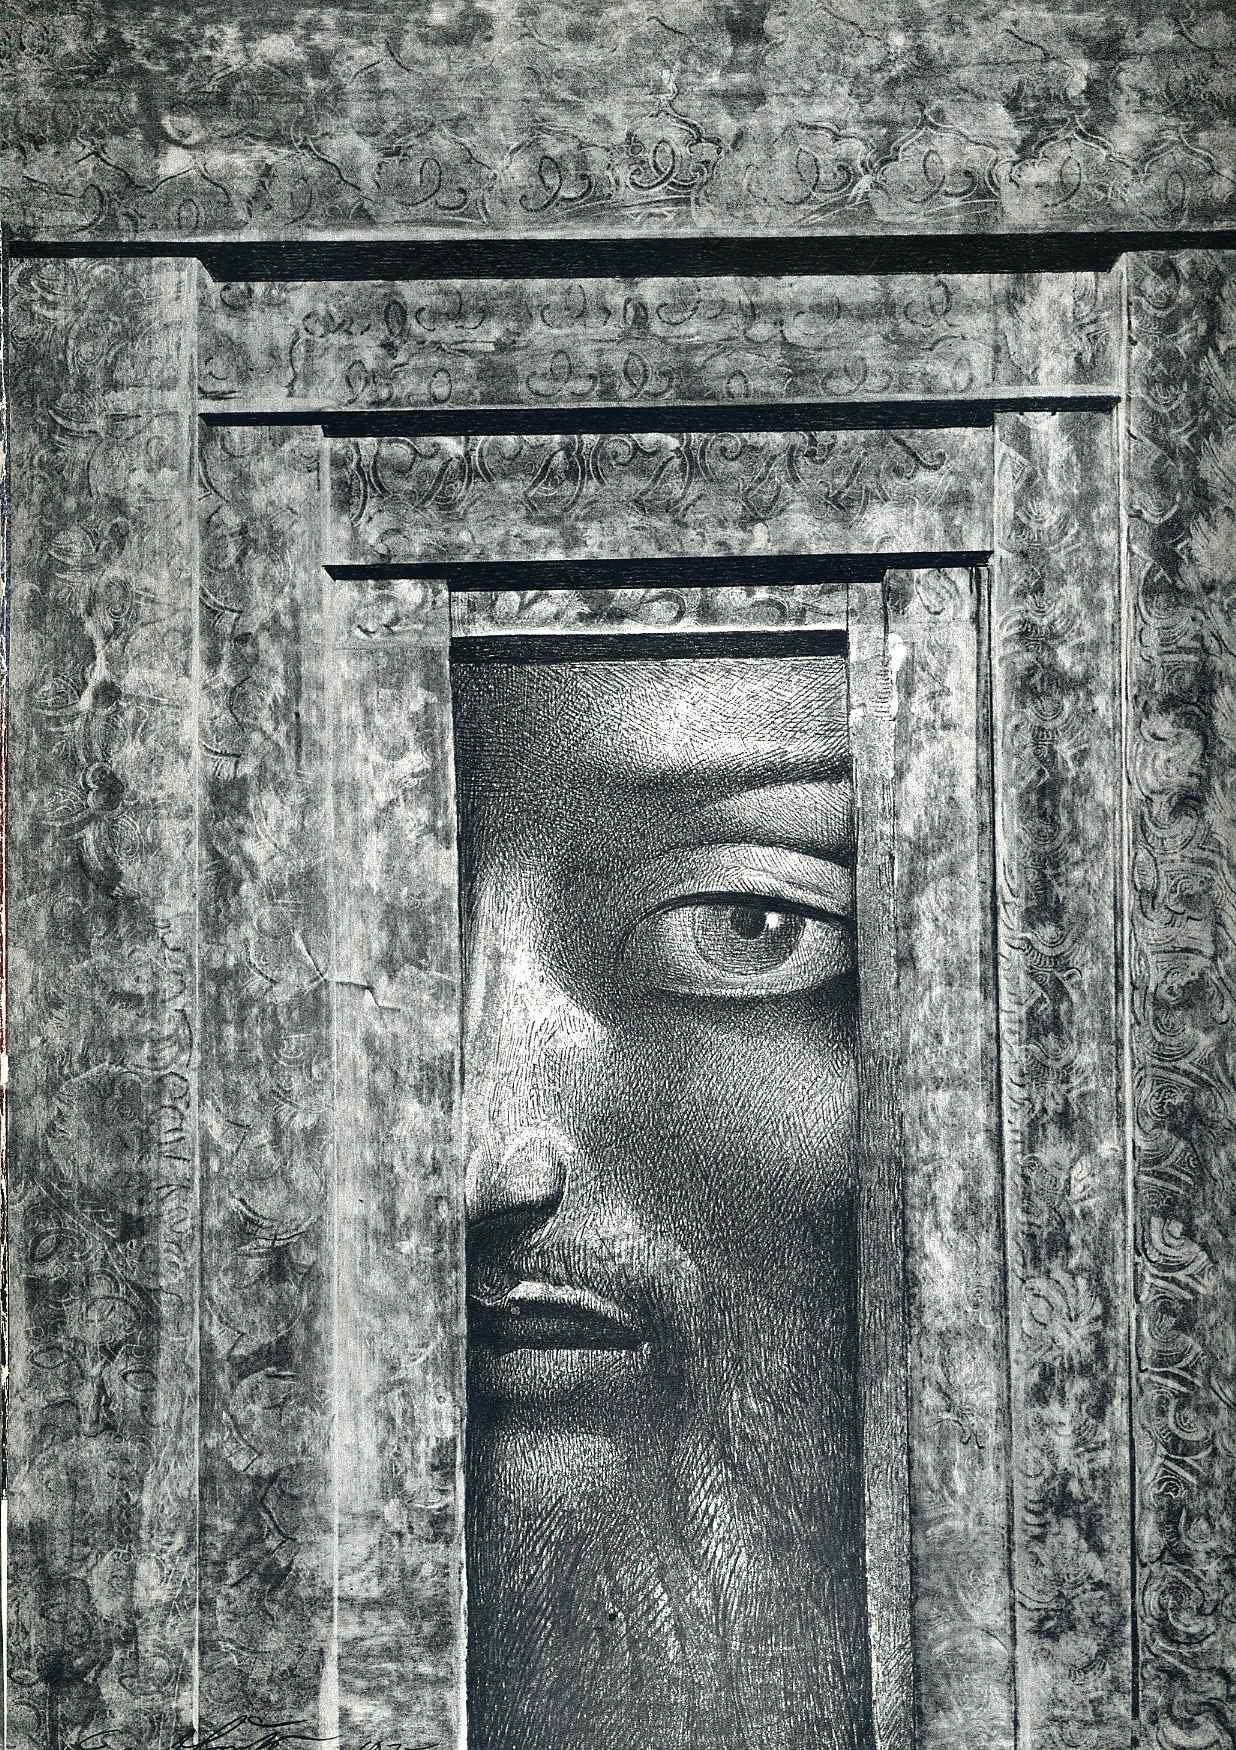 Ernst Fuchs Architectura caelestis — DOP